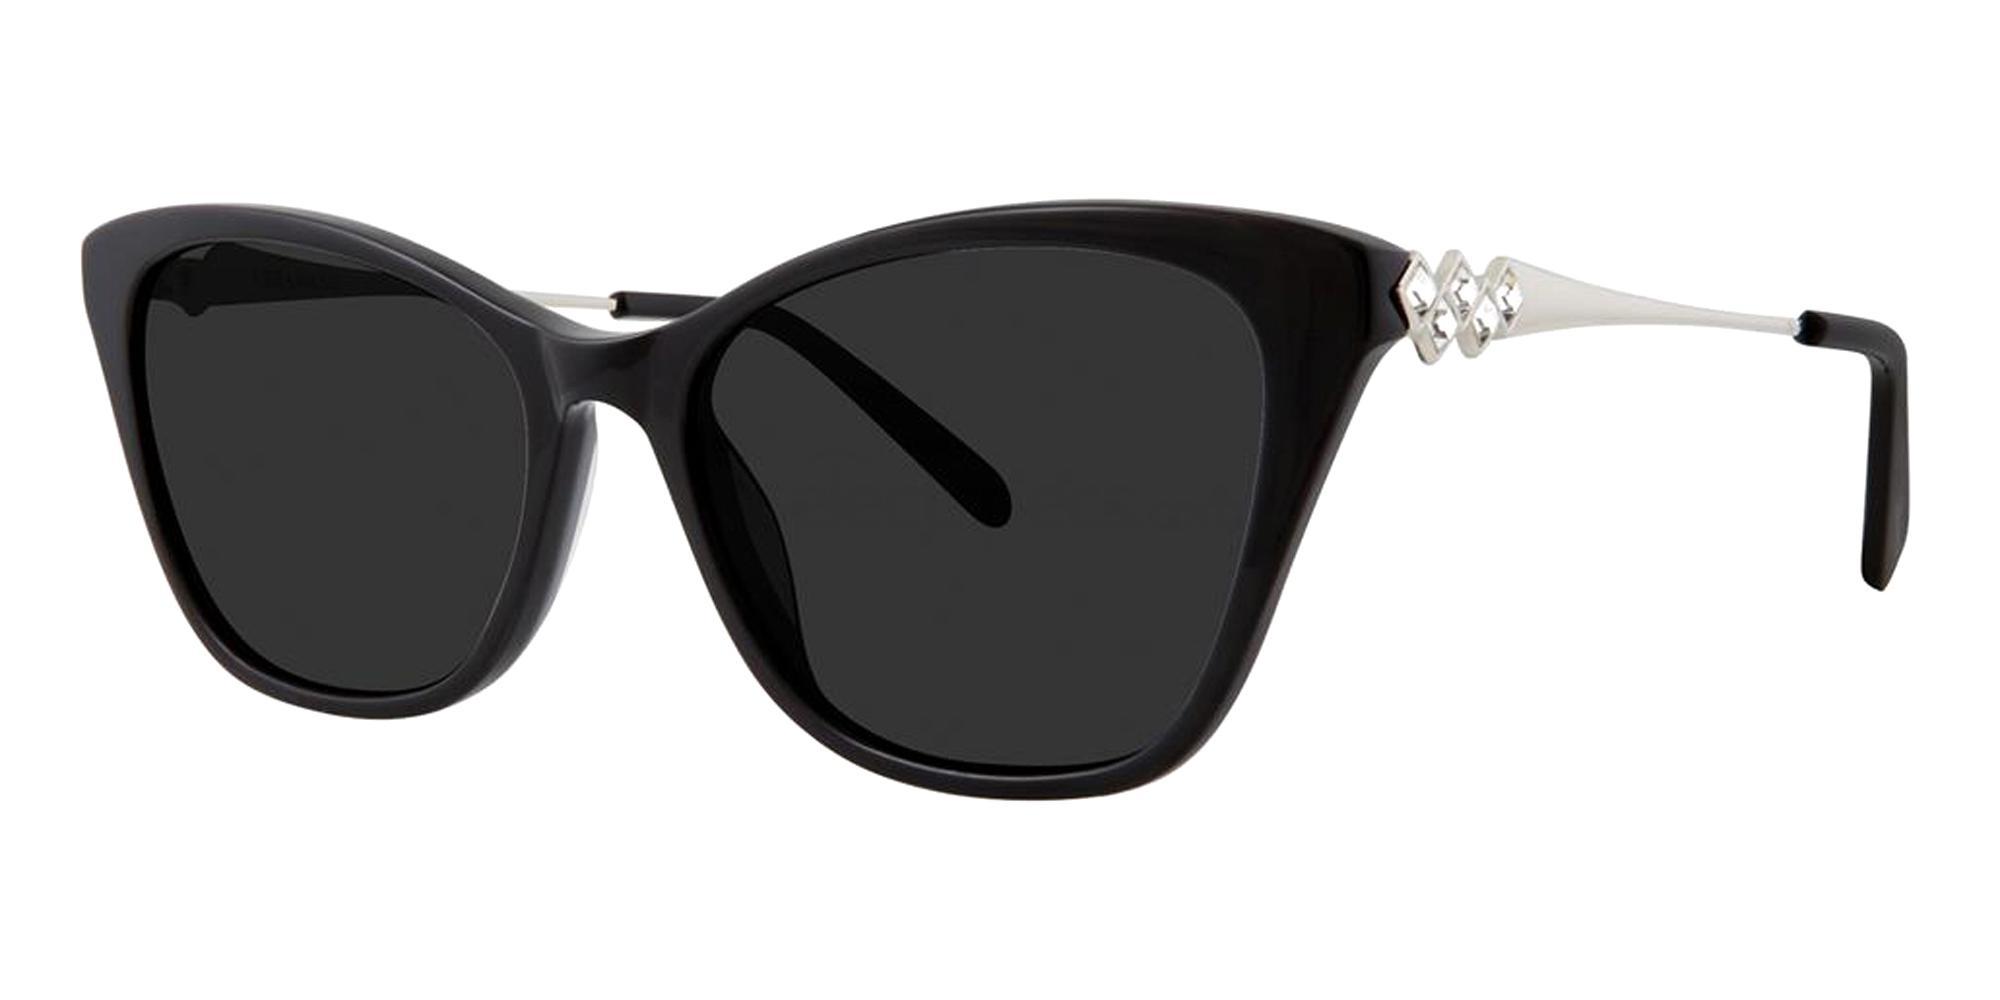 Black CAYDEE Sunglasses, Vera Wang Luxe